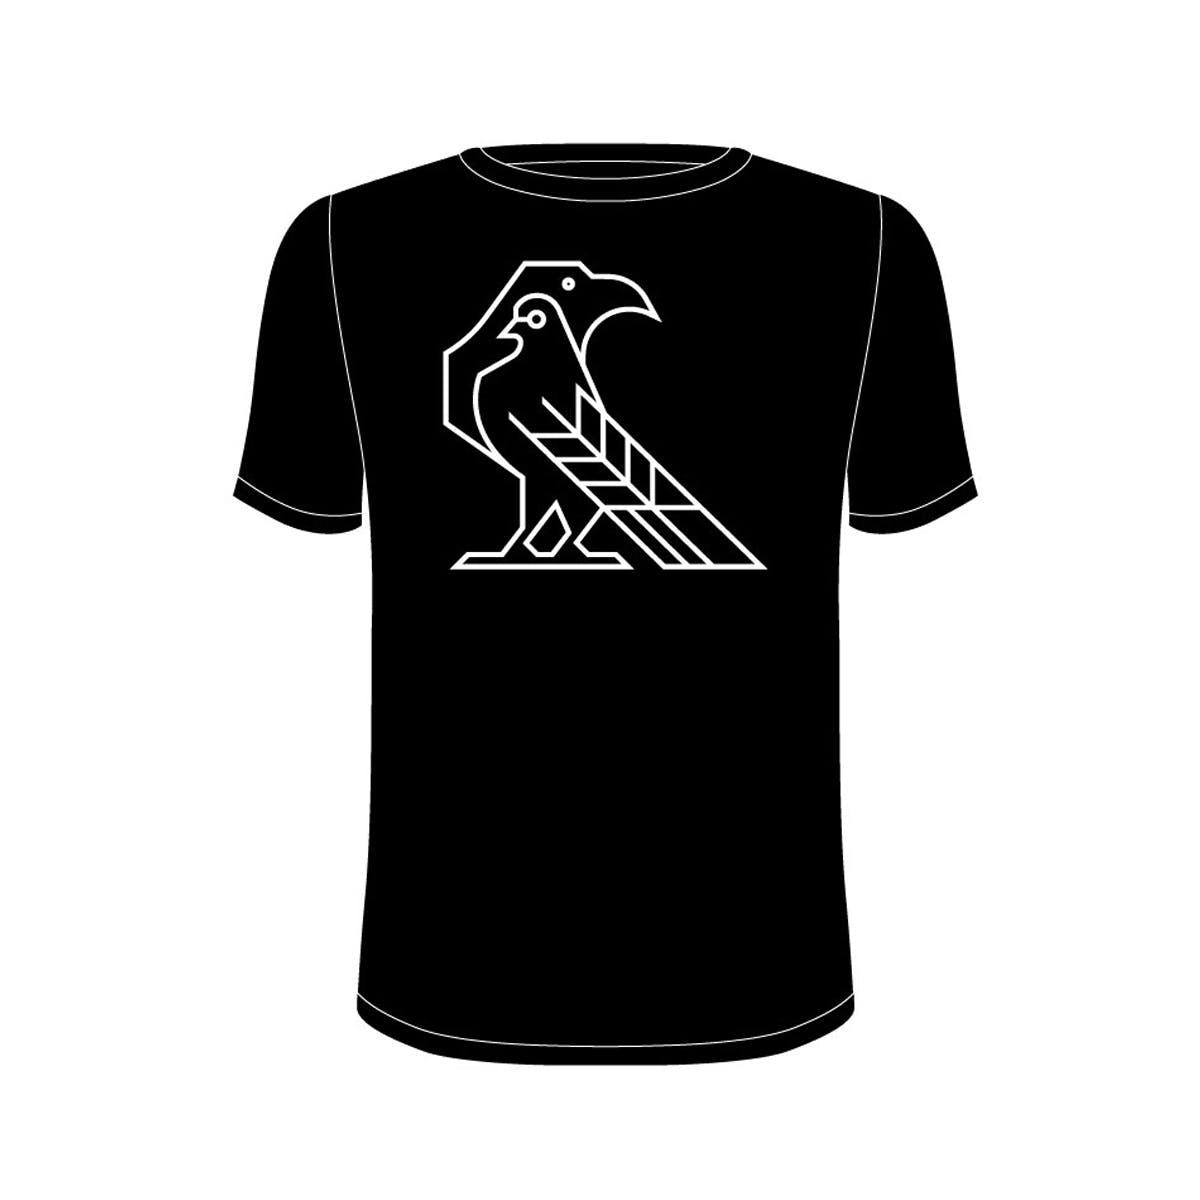 Copy of logo-t-black-front